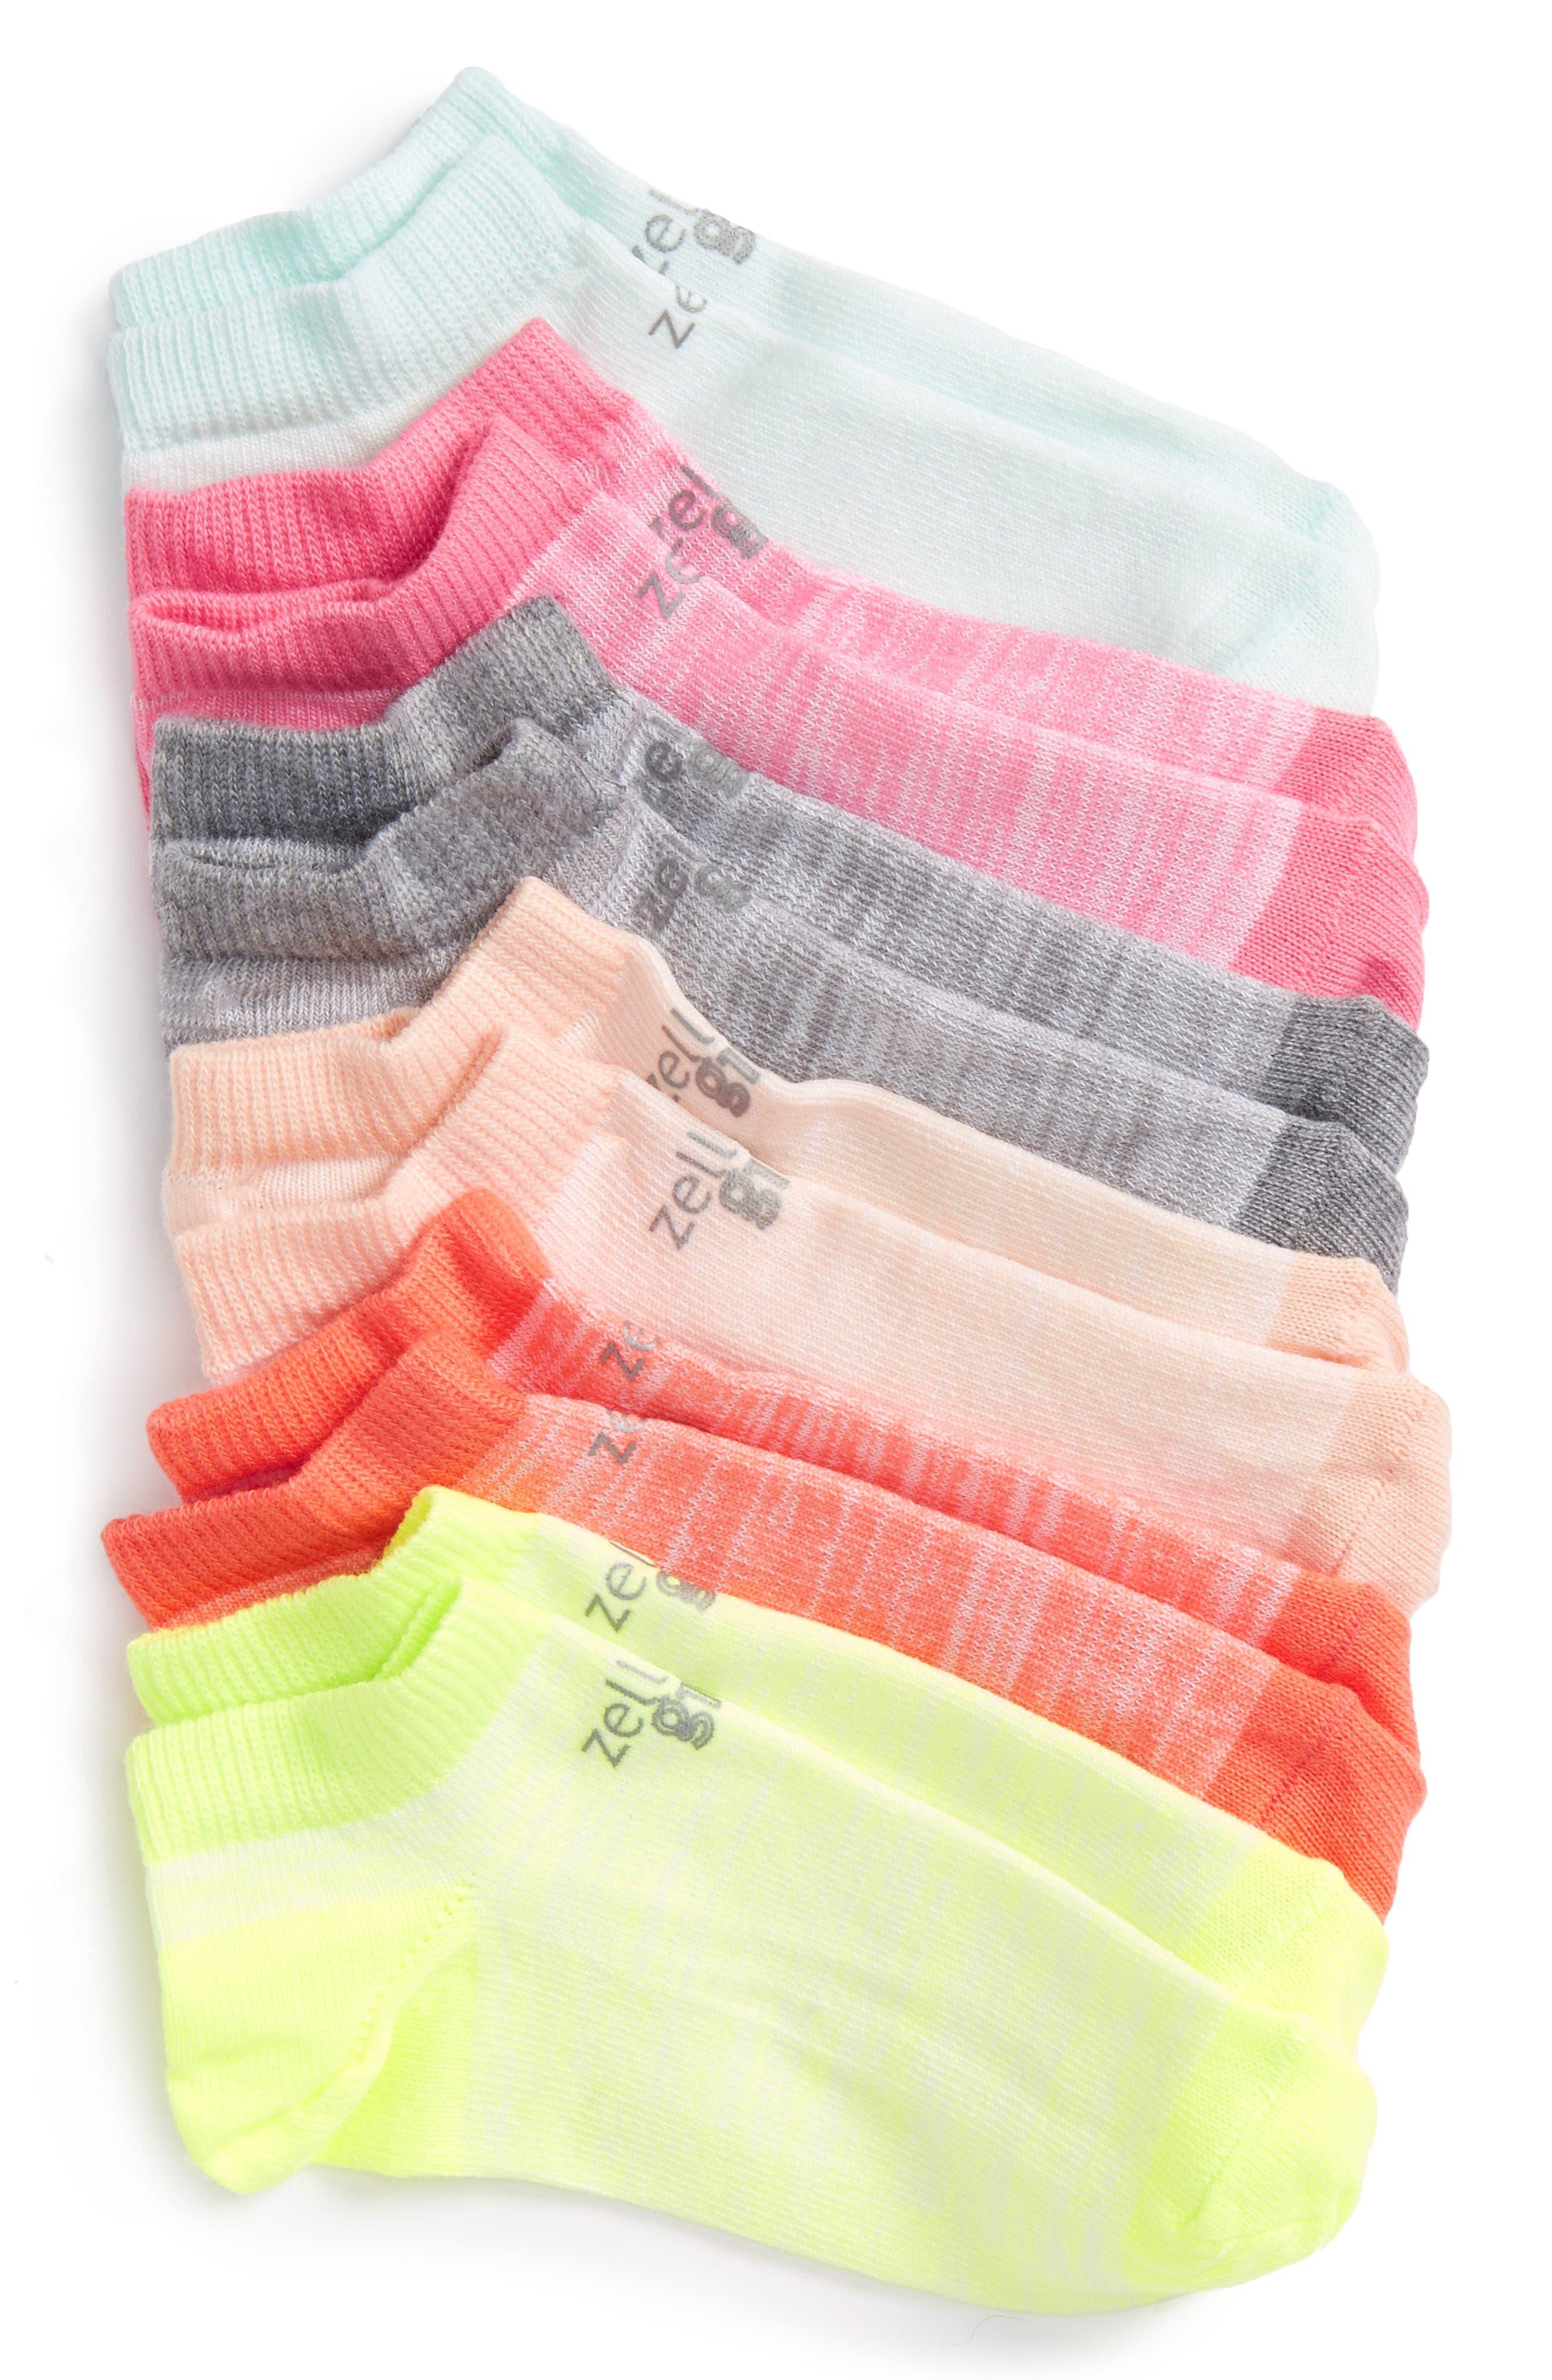 Zella Girl 6-Pack Ankle Socks (Toddler, Little Kid & Big Kid)